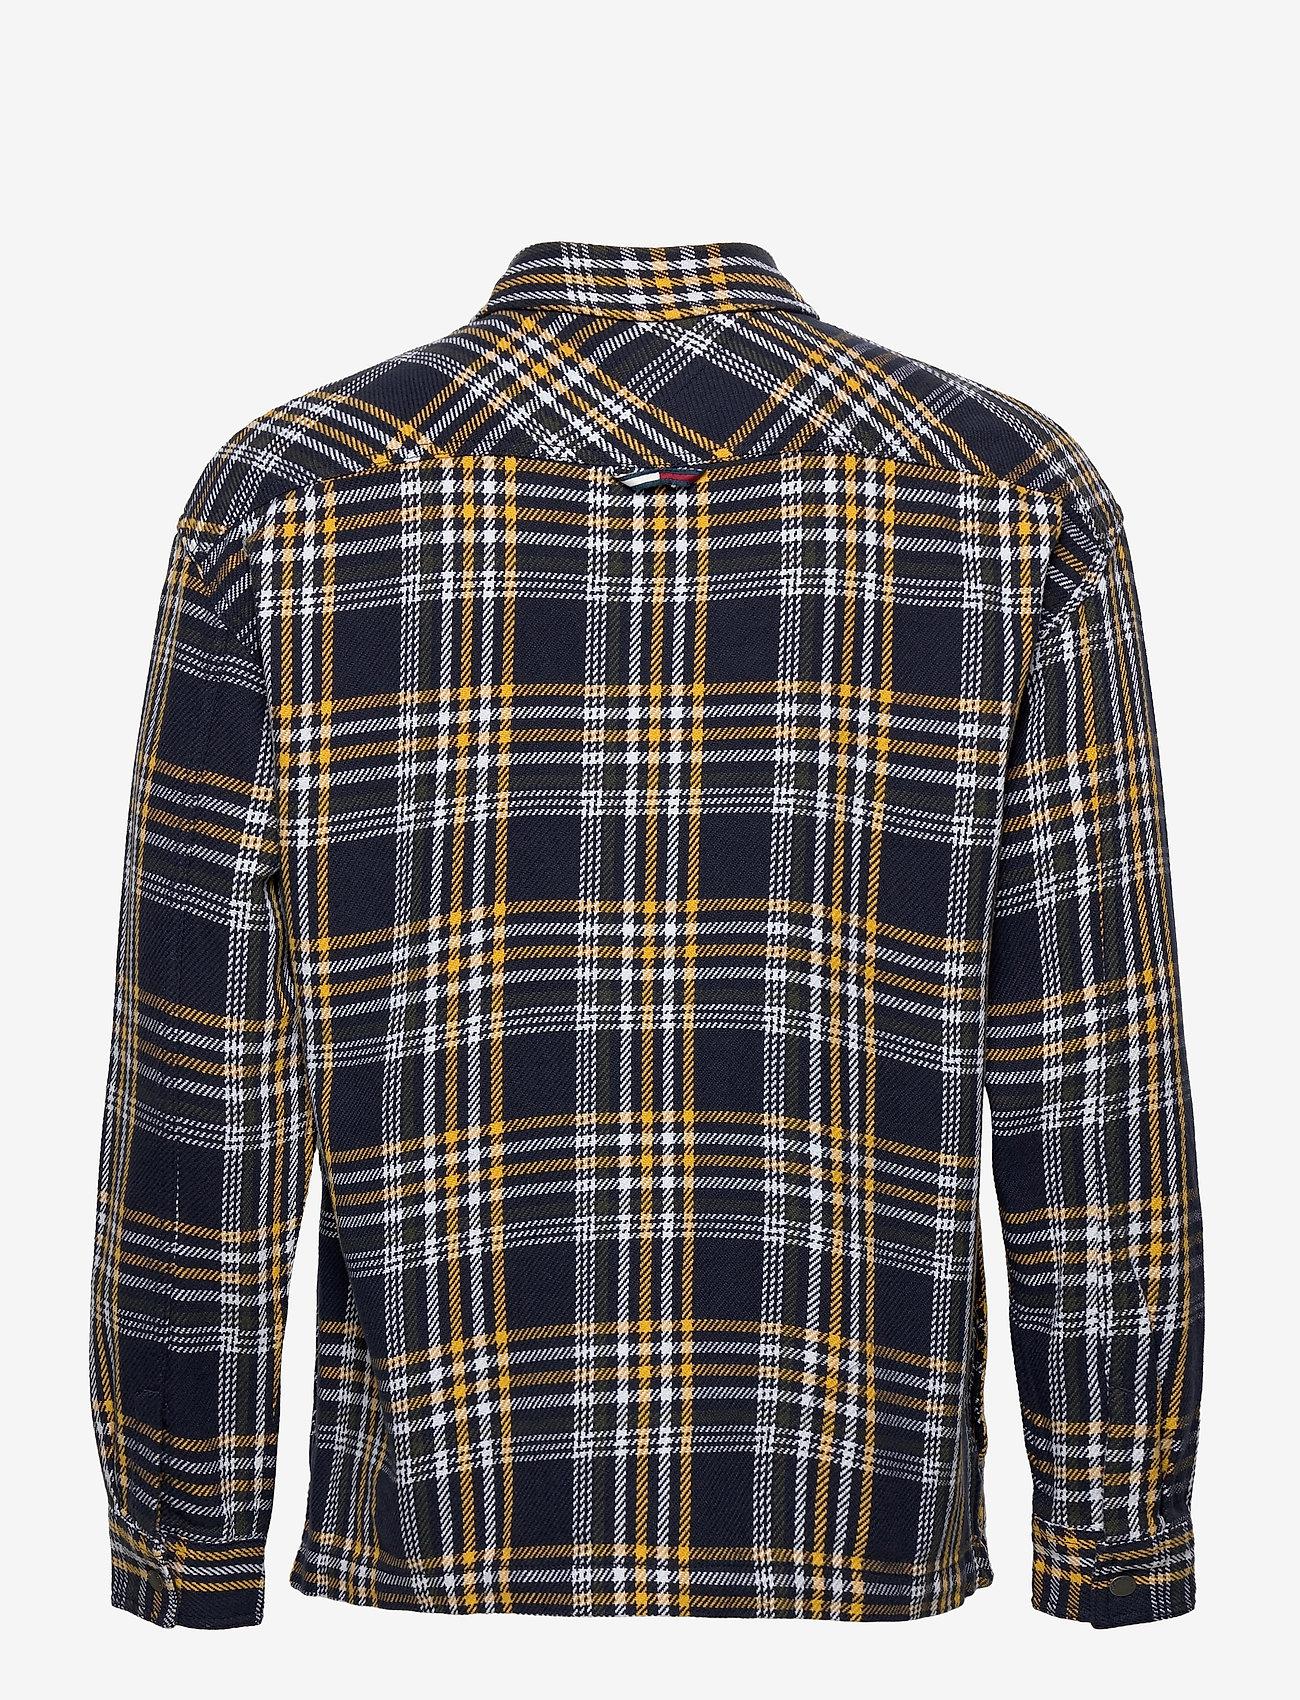 Tommy Jeans - TJM CHECK ZIP OVERSHIRT - kläder - twilight navy / multi - 1